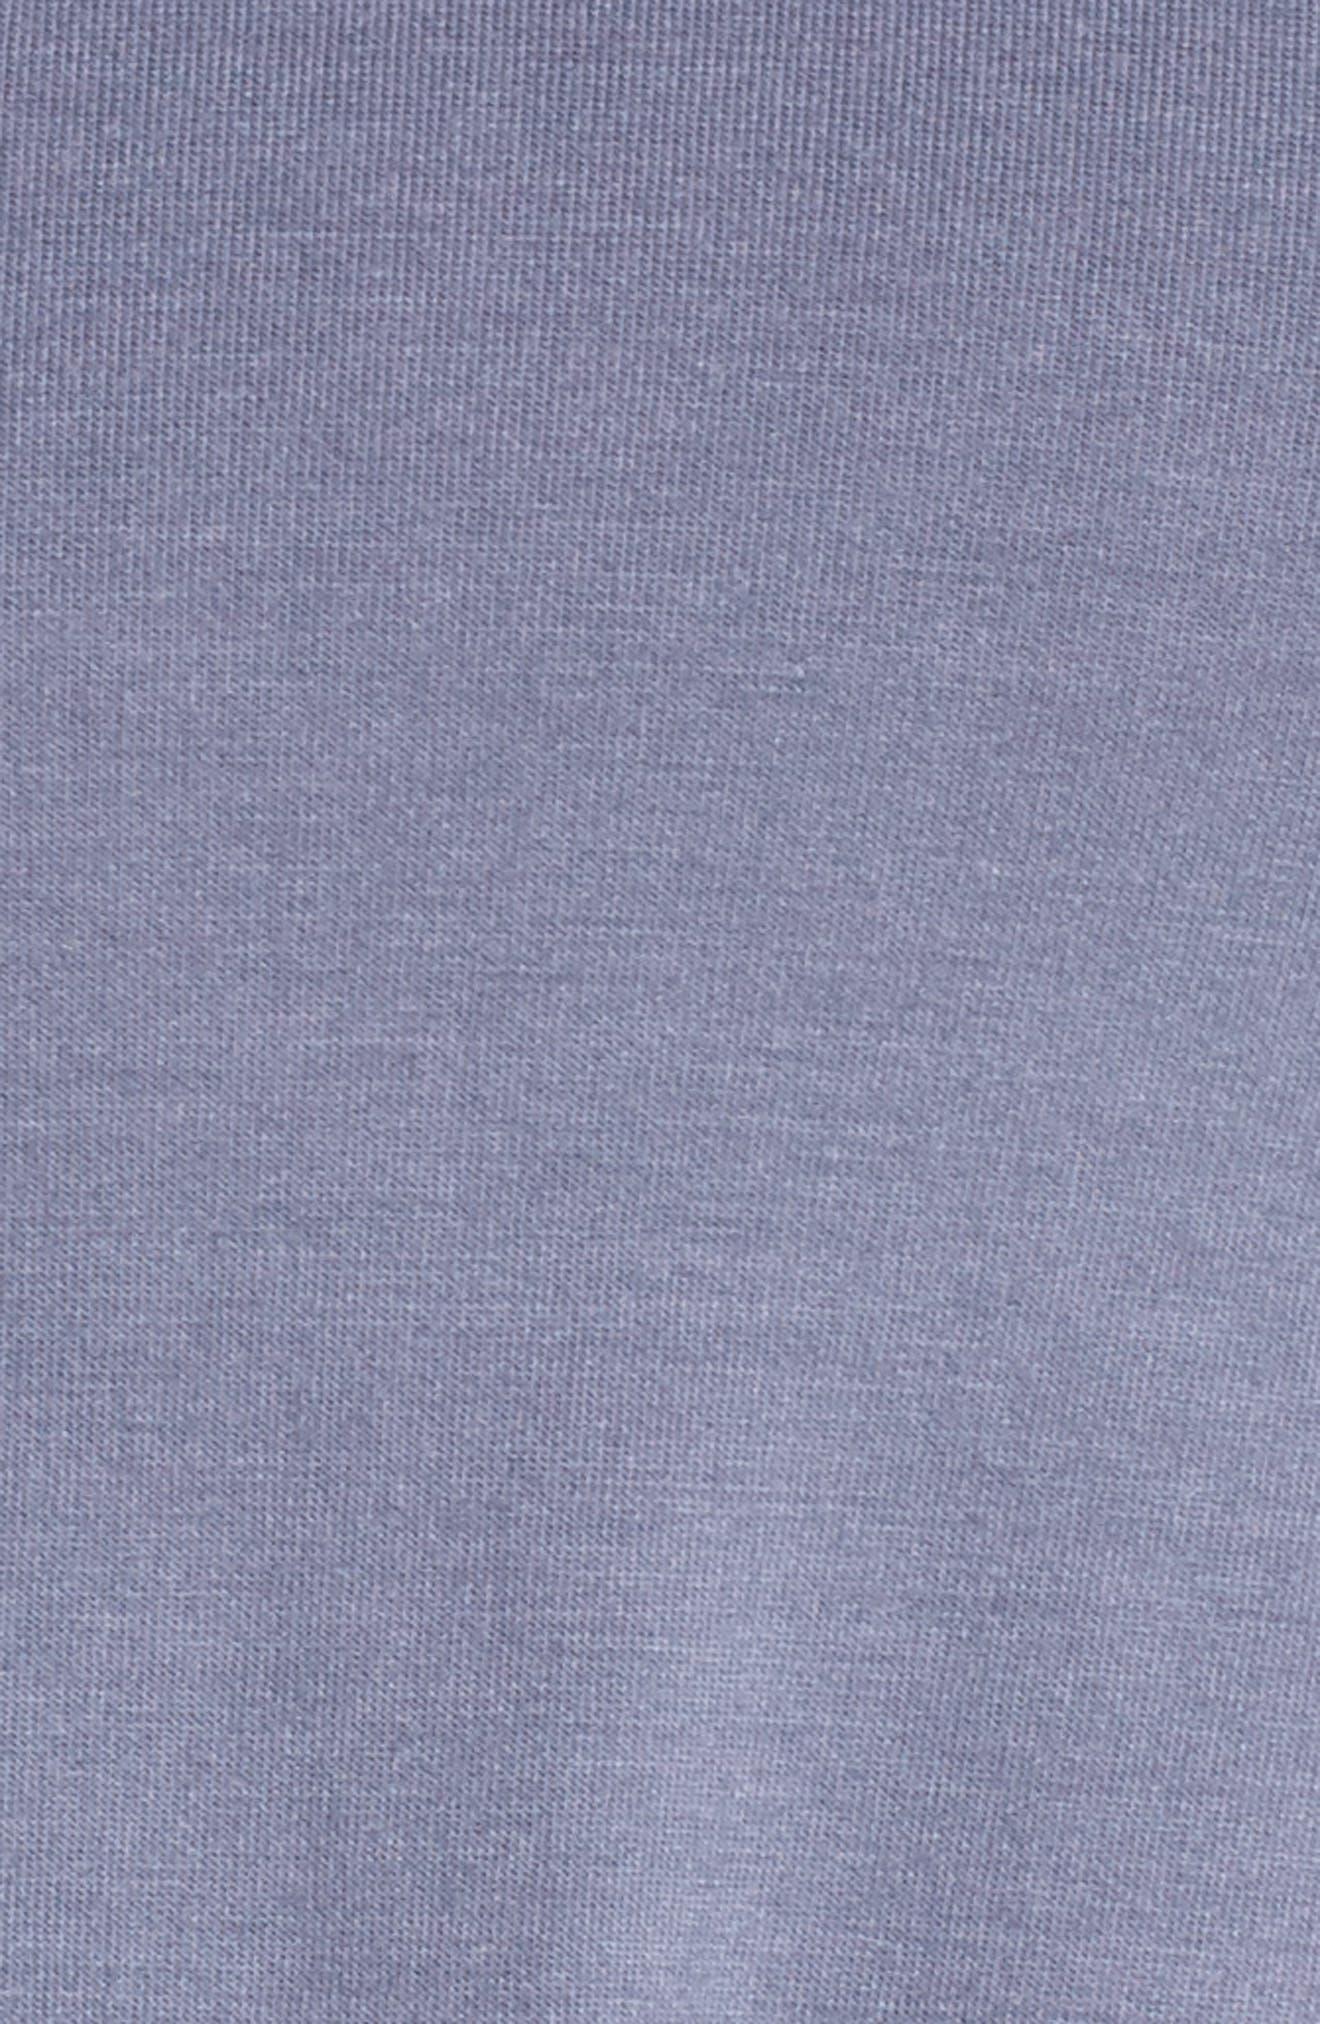 Crop Top,                             Alternate thumbnail 6, color,                             Slate Blue